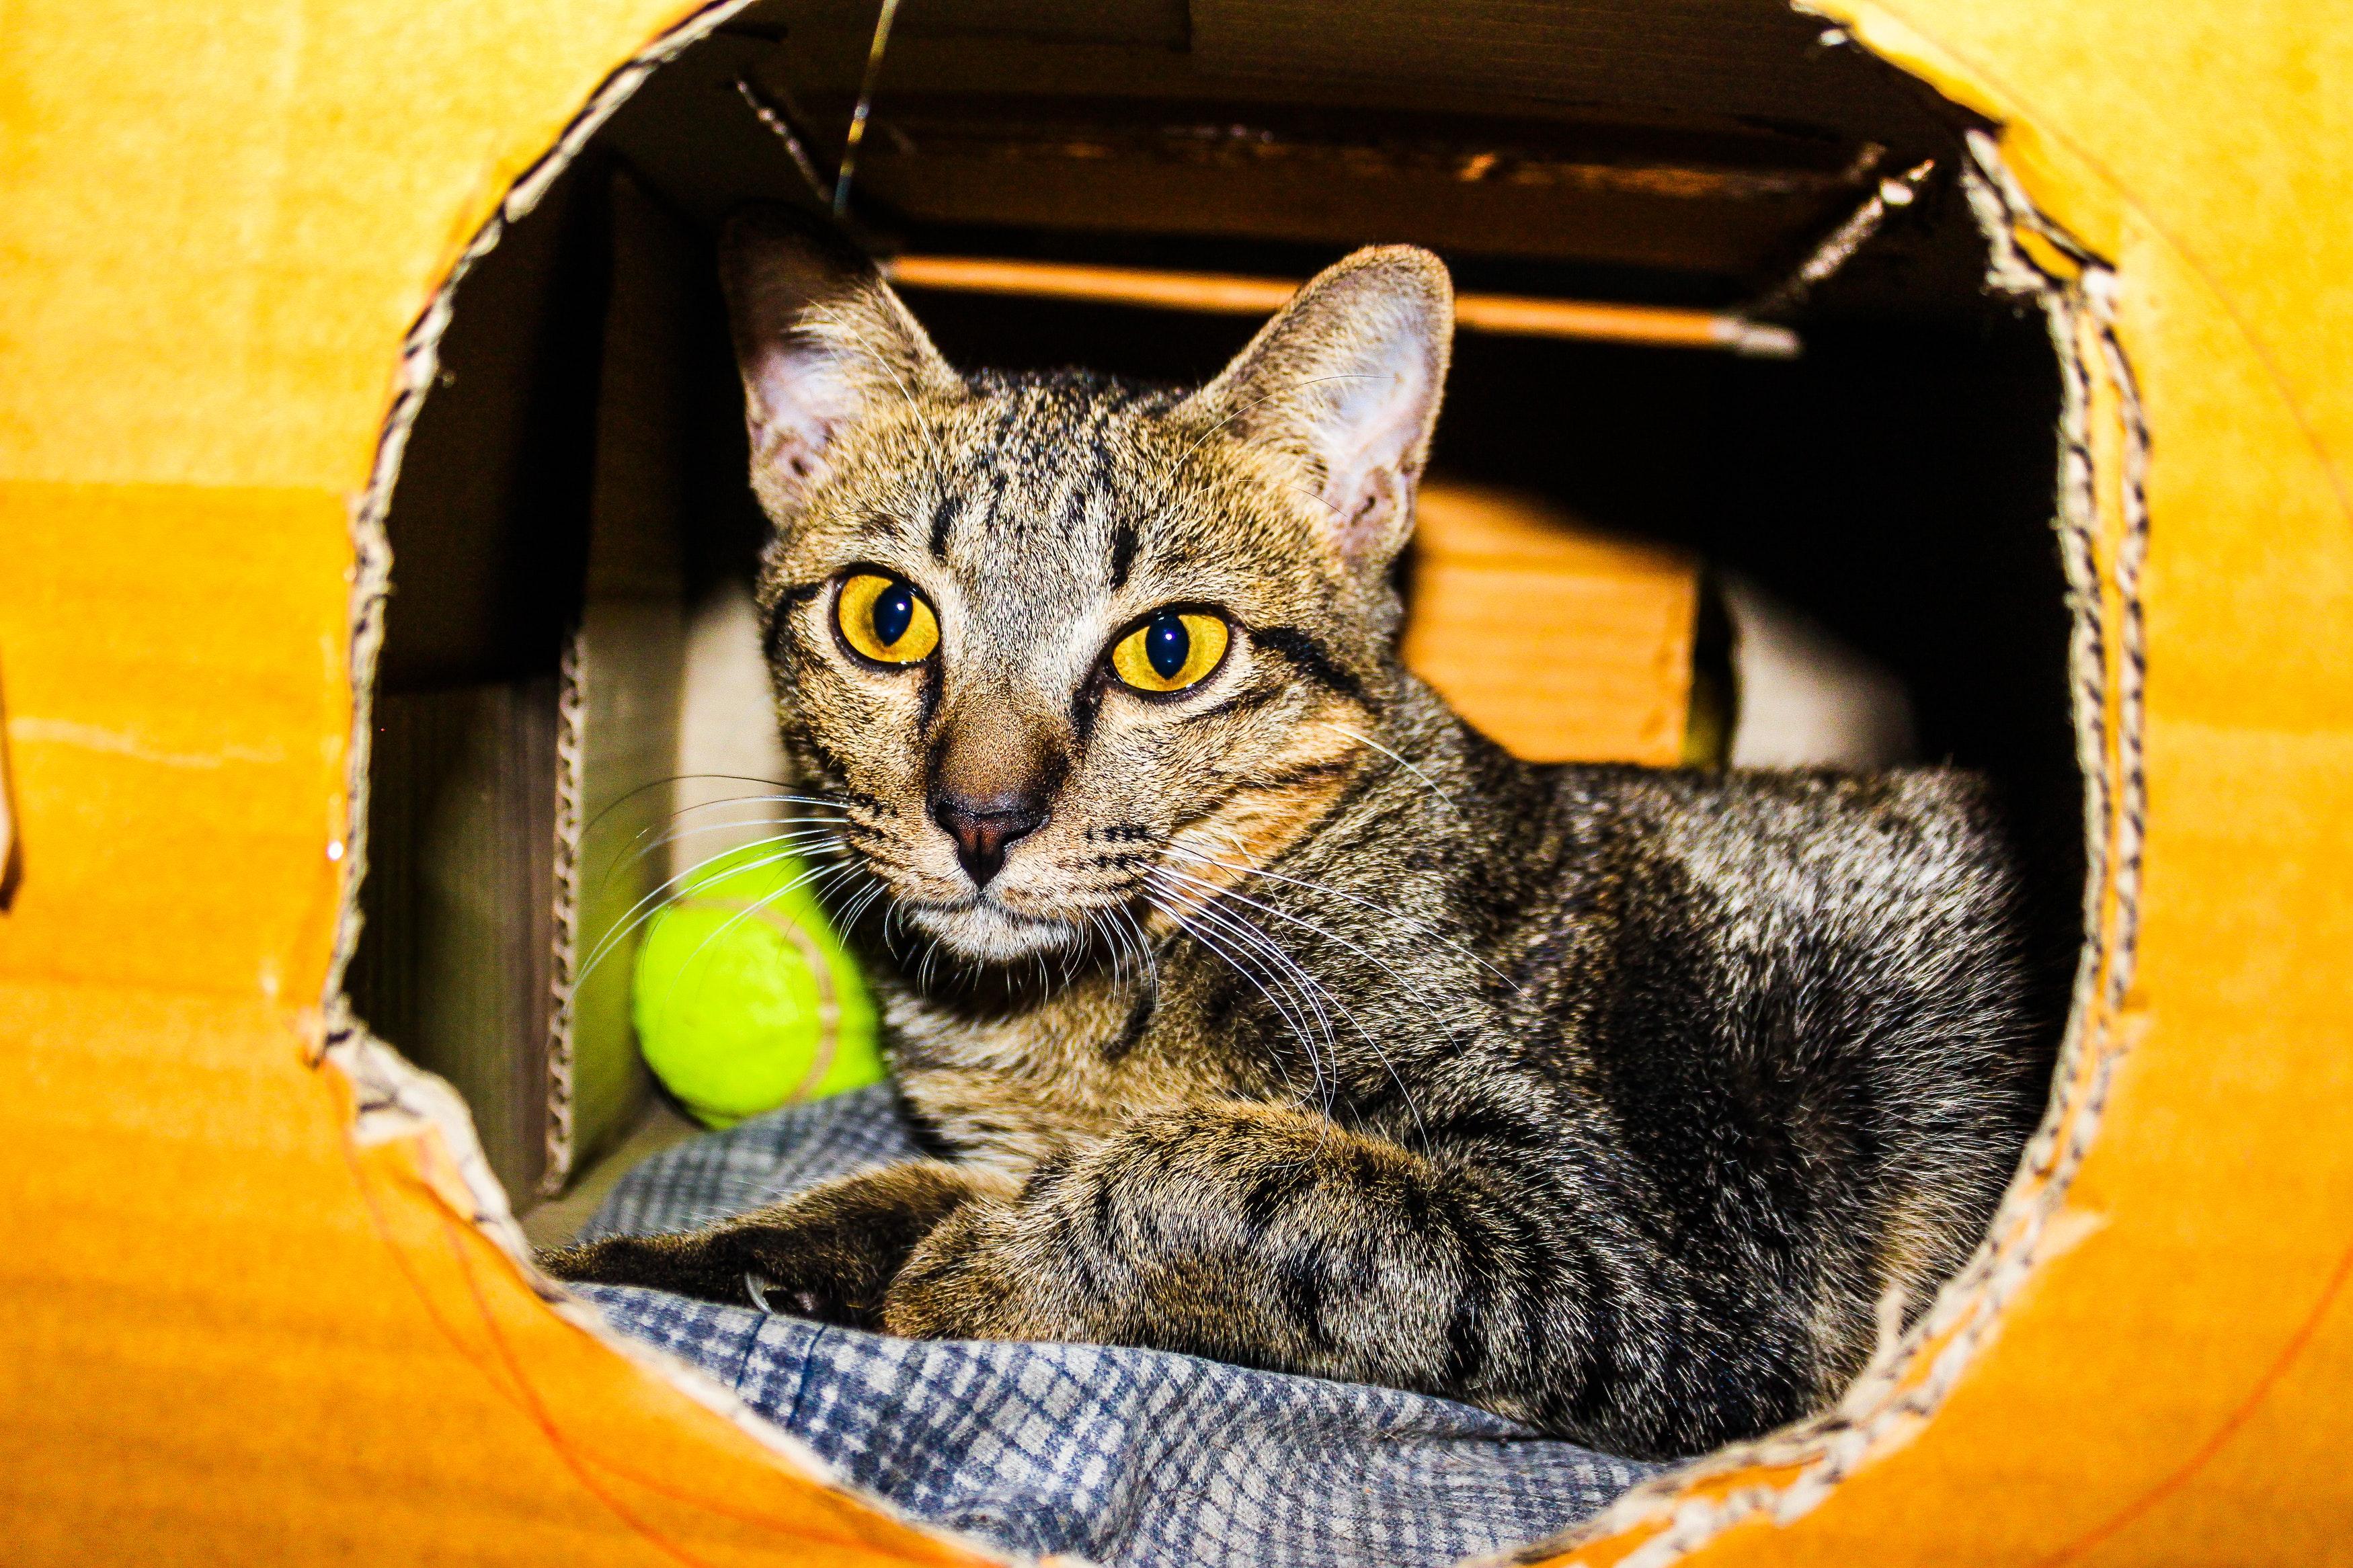 Silver tabby cat inside a brown cardboard box photo